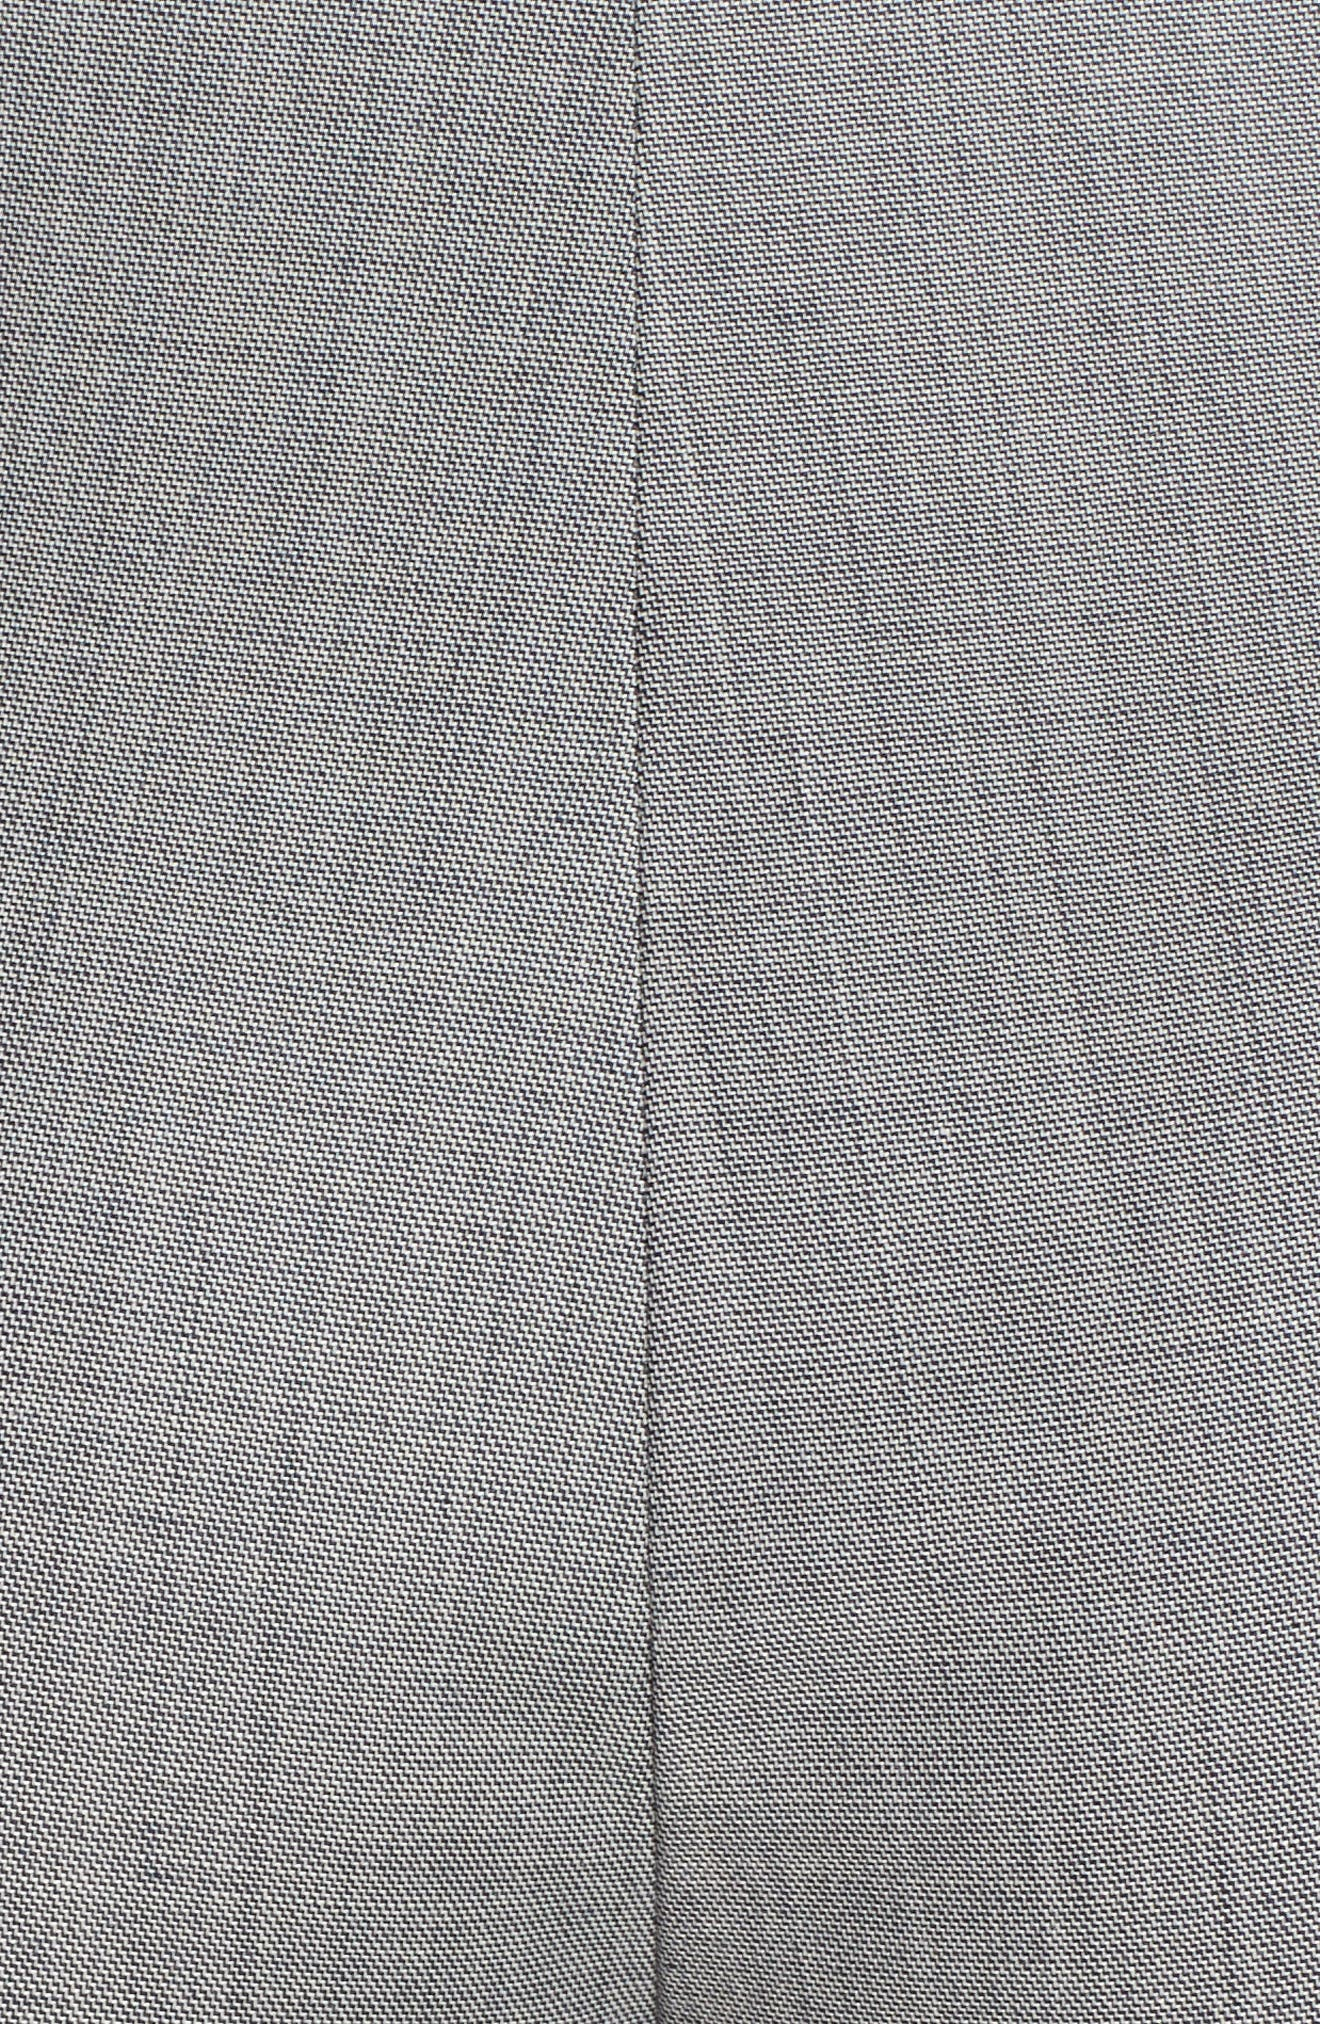 Sharkskin Stretch Wool Blend Skinny Ankle Pants,                             Alternate thumbnail 5, color,                             GREY MULTI